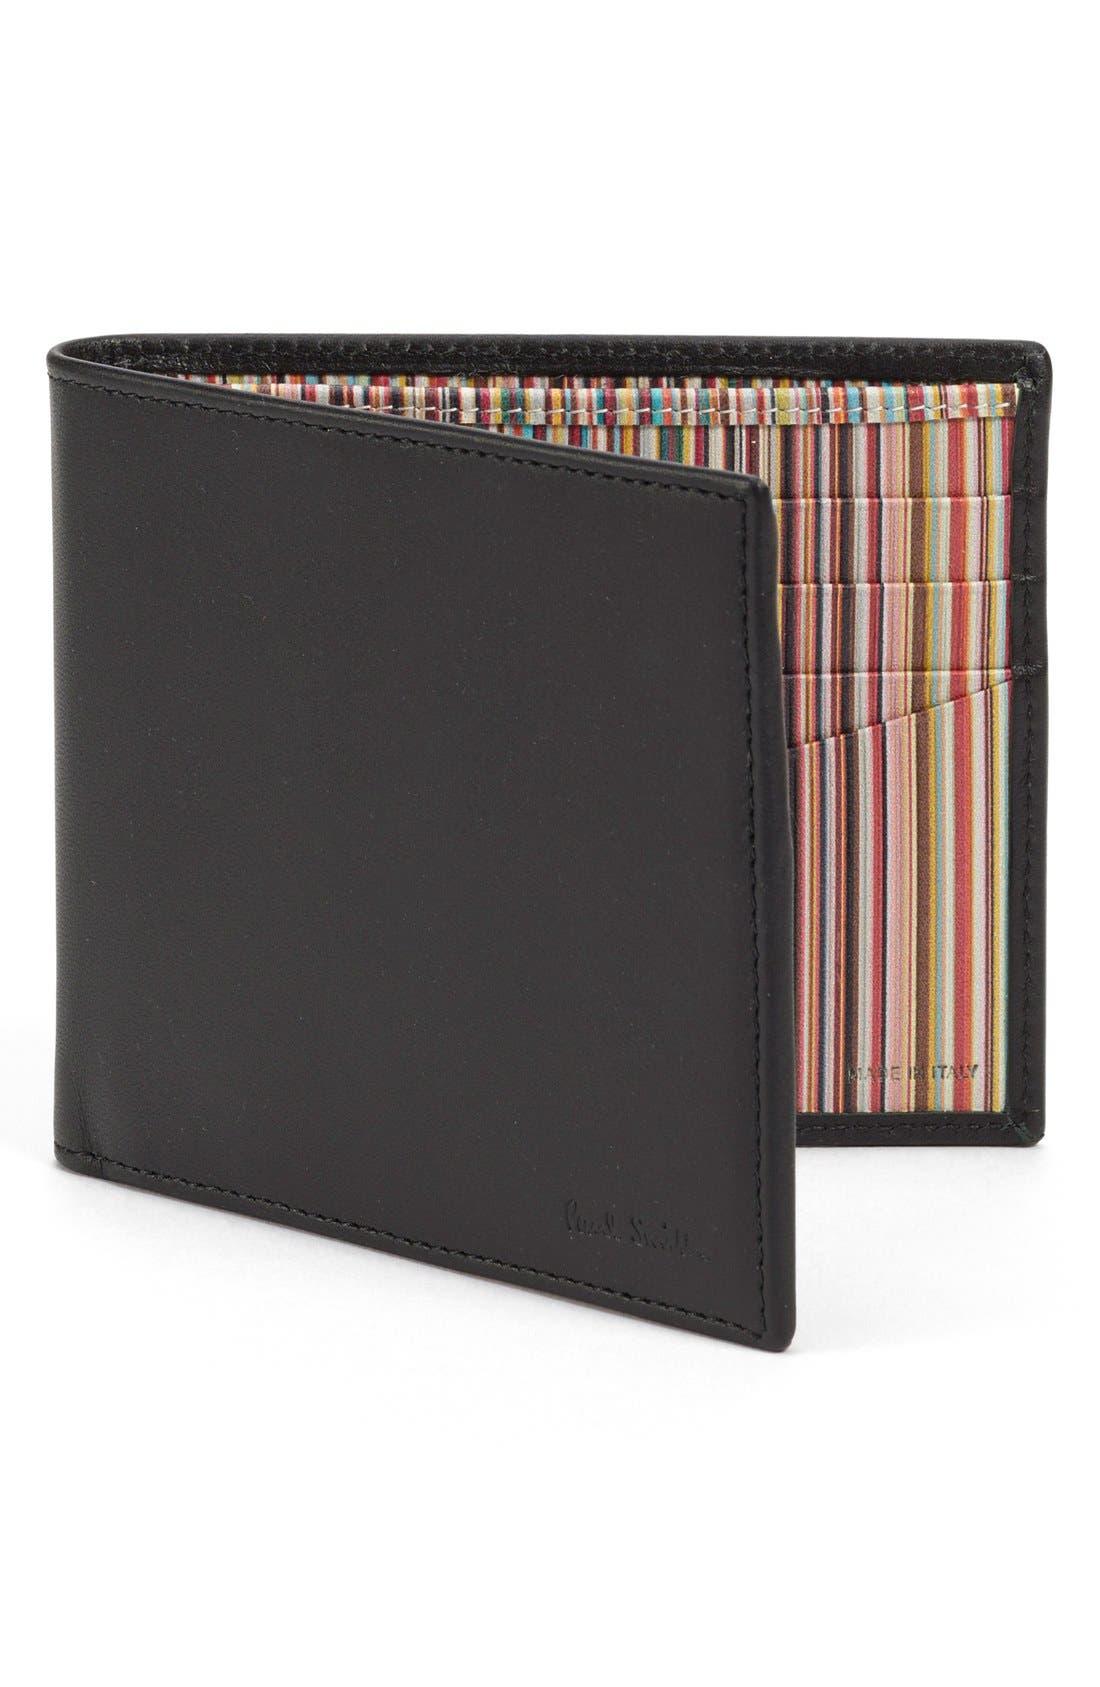 Interior Stripe Leather Billfold,                         Main,                         color, Black